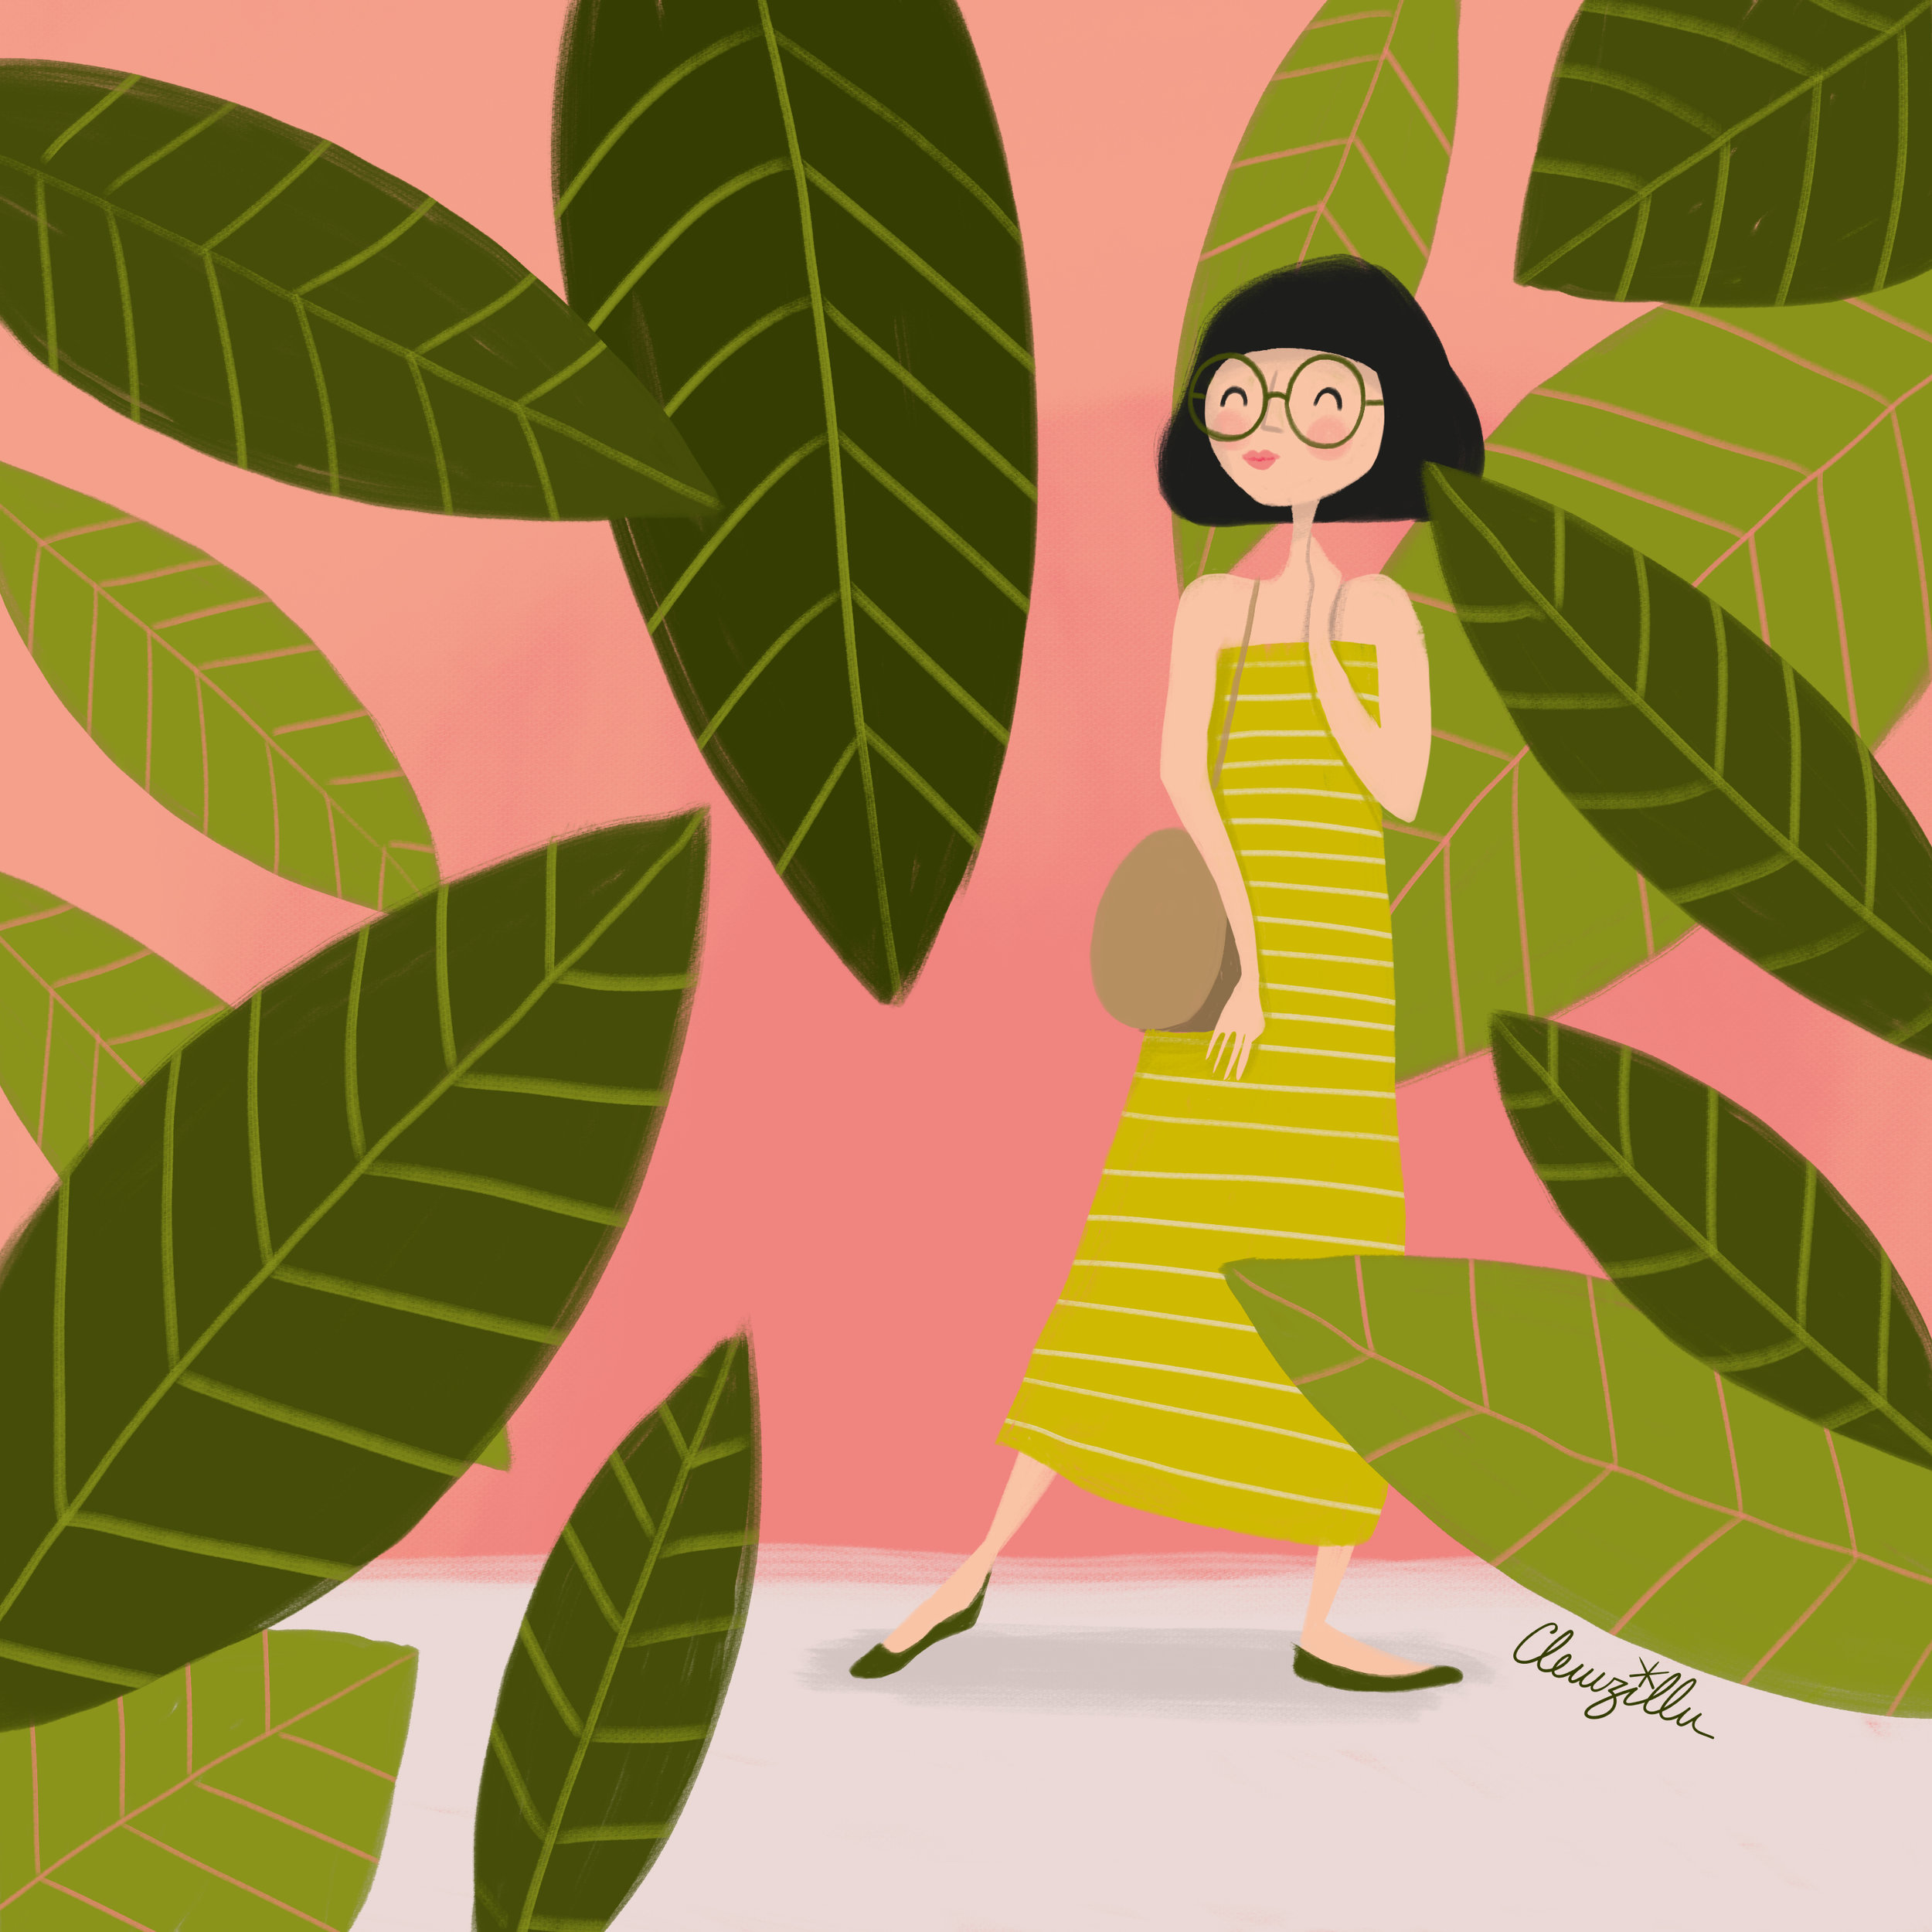 illustration mode fille - lyon - paris - france